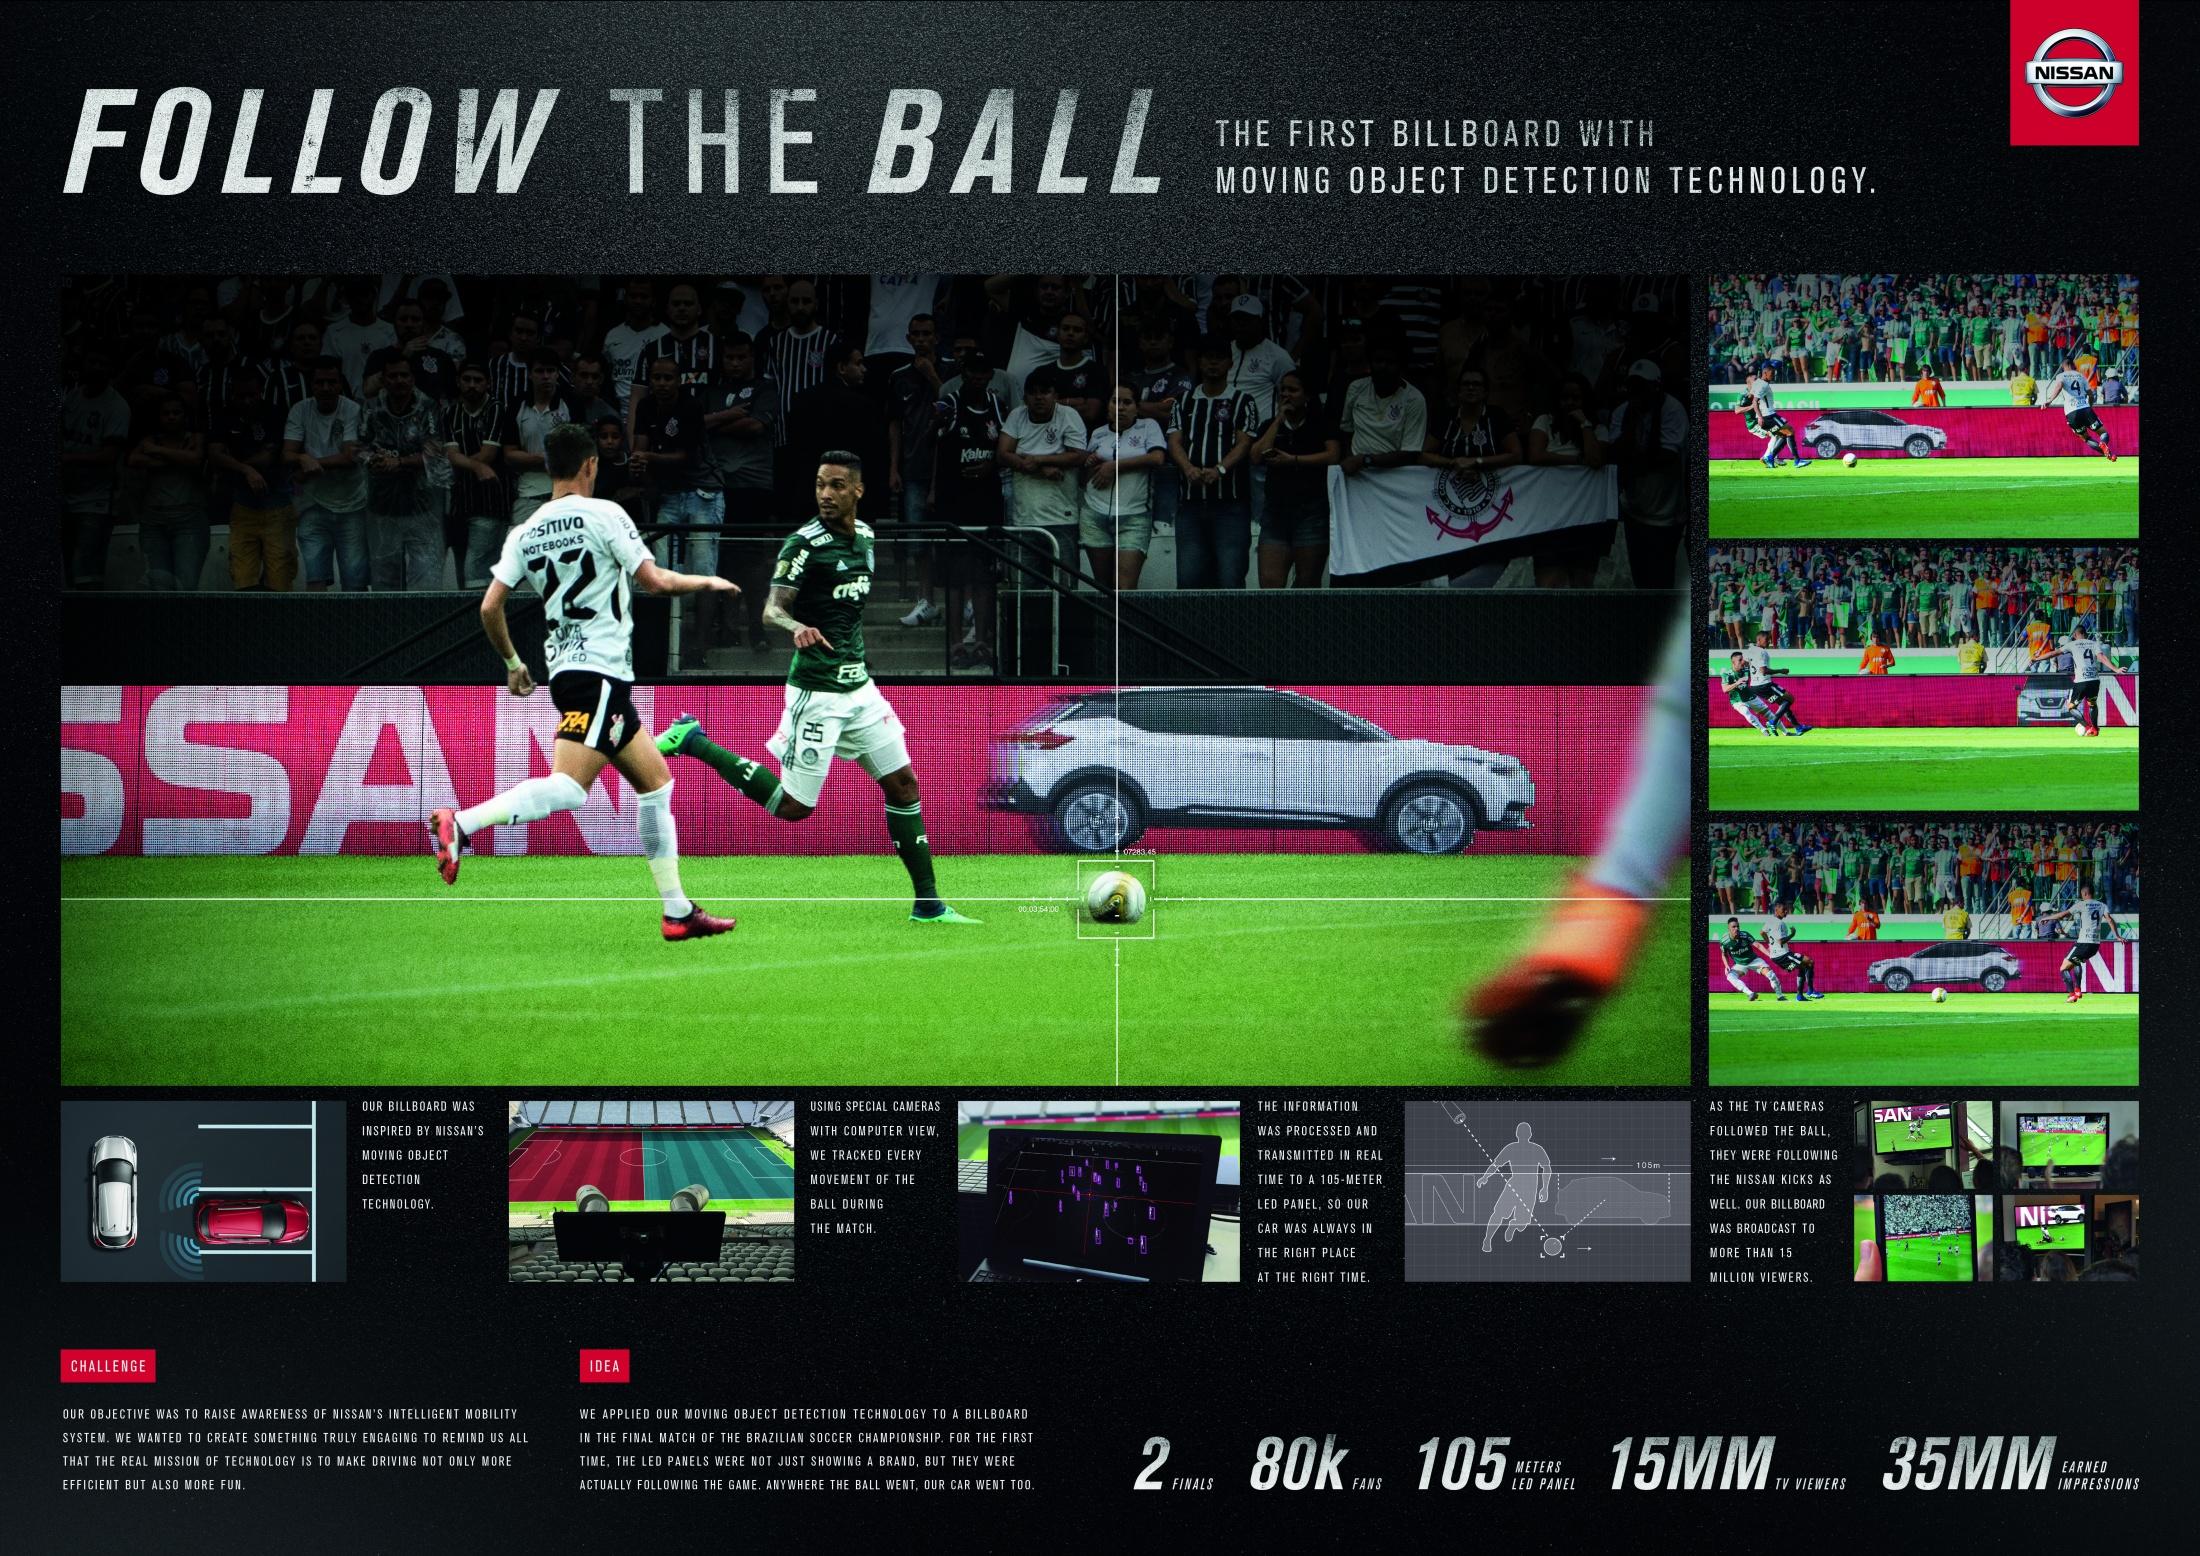 Thumbnail for Nissan's Follow the Ball